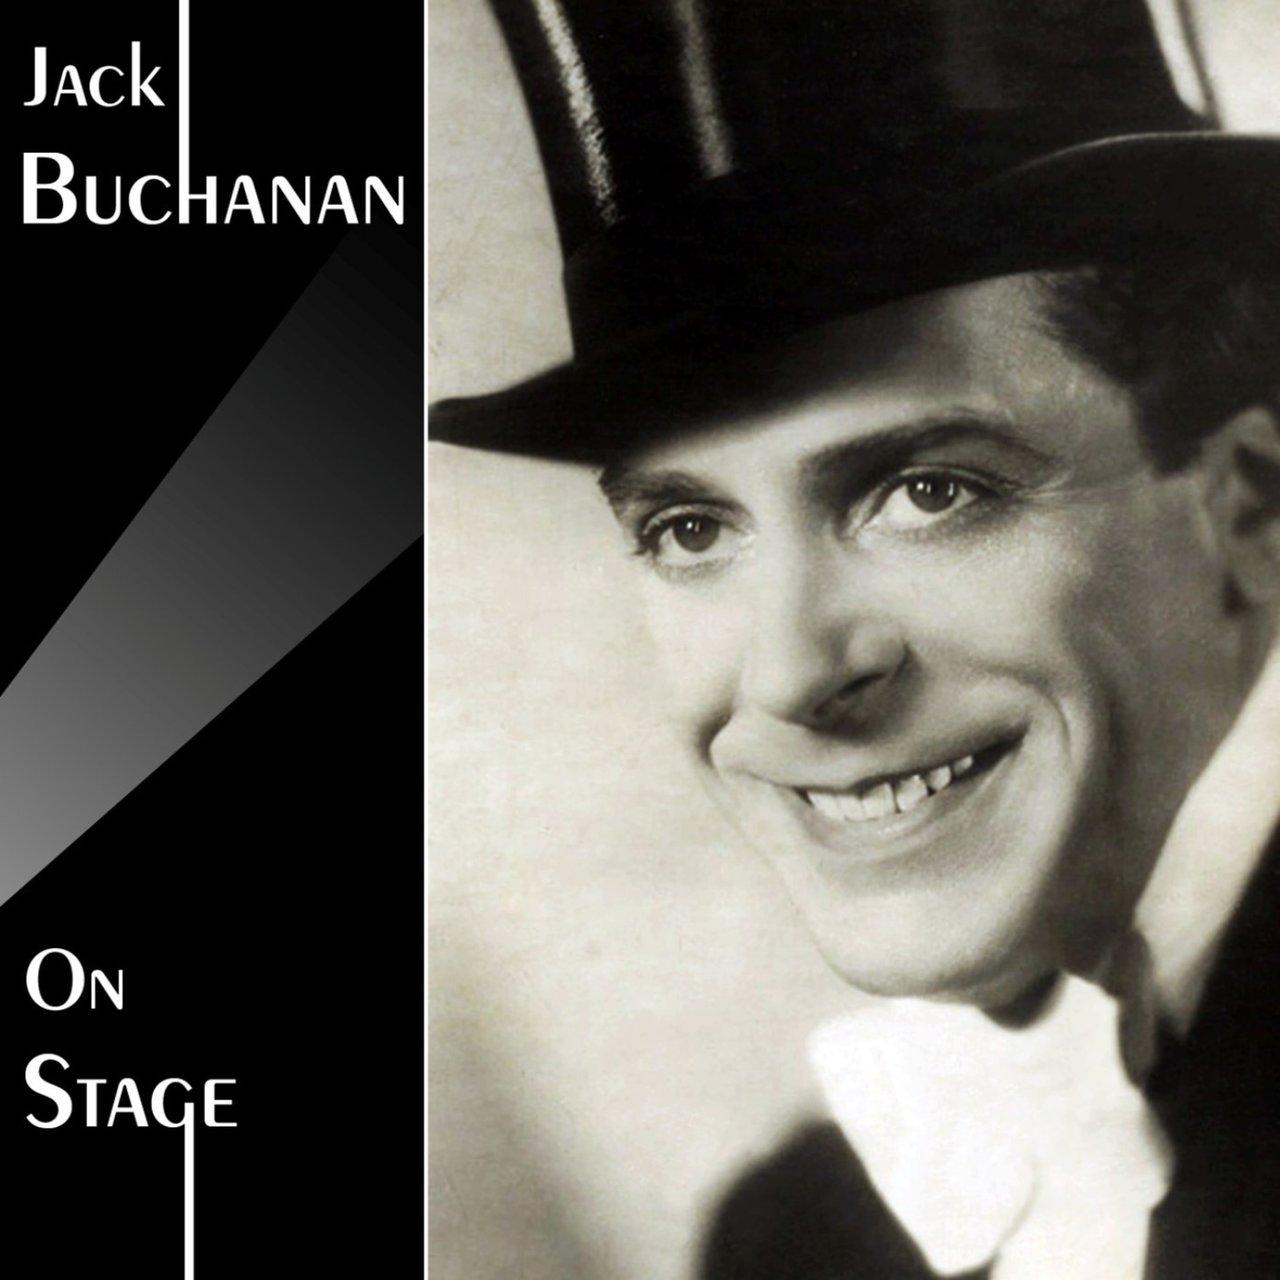 Jim Broadbent (born 1949),Kana Tsugihara Hot picture Pell James,Vivian Vance born July 26, 1909